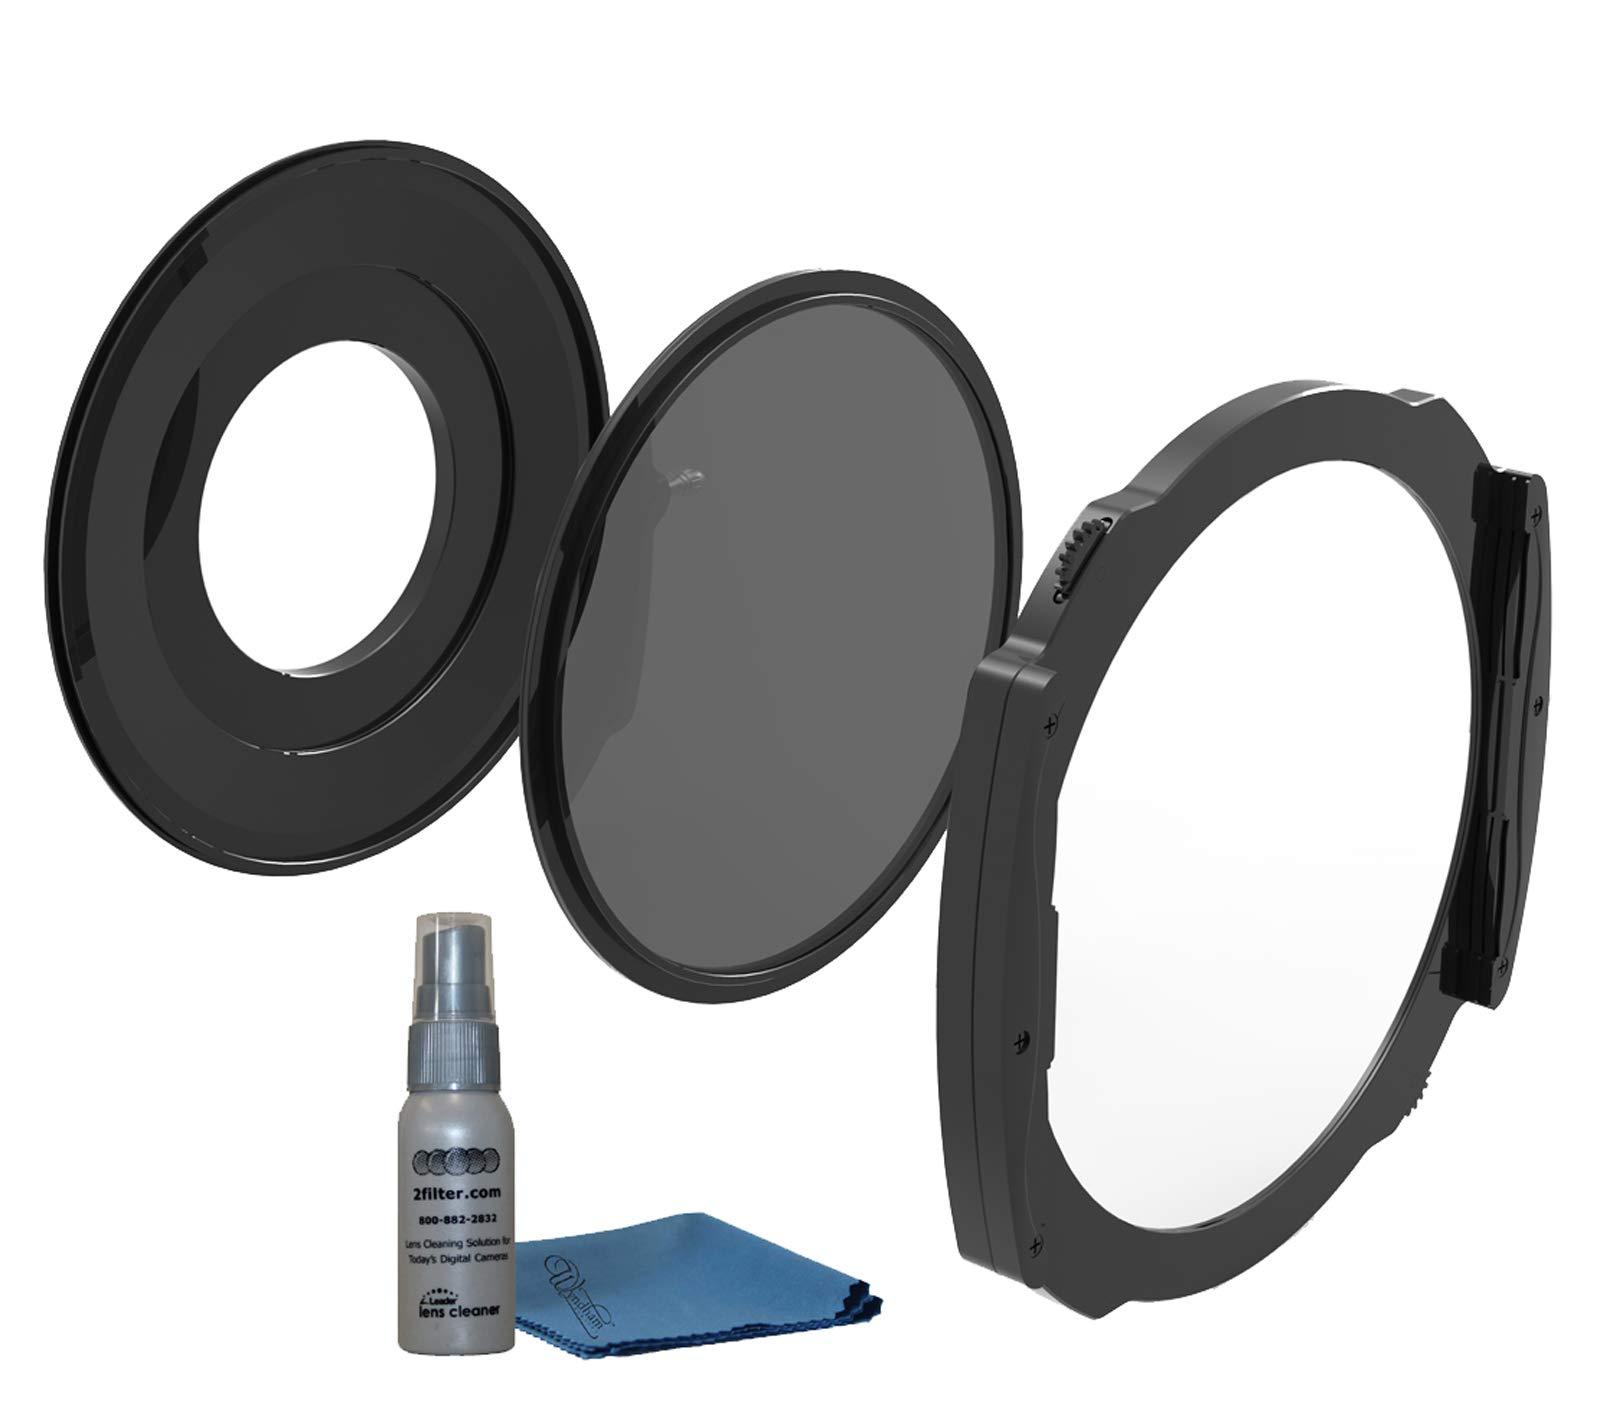 Haida M15 Filter Holder System for Nikon 14-24mm f/2.8G ED Lens 150mm Filter System and M15 Circular Polarizer by Haida